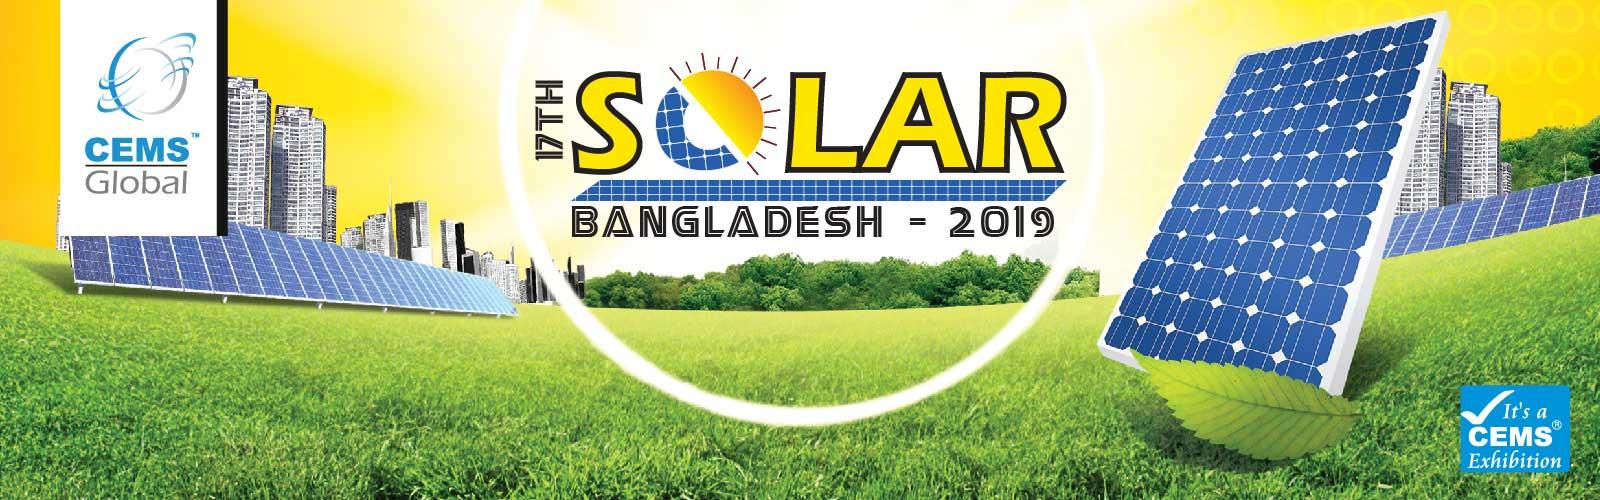 17th Solar Bangladesh 2019 International Expo